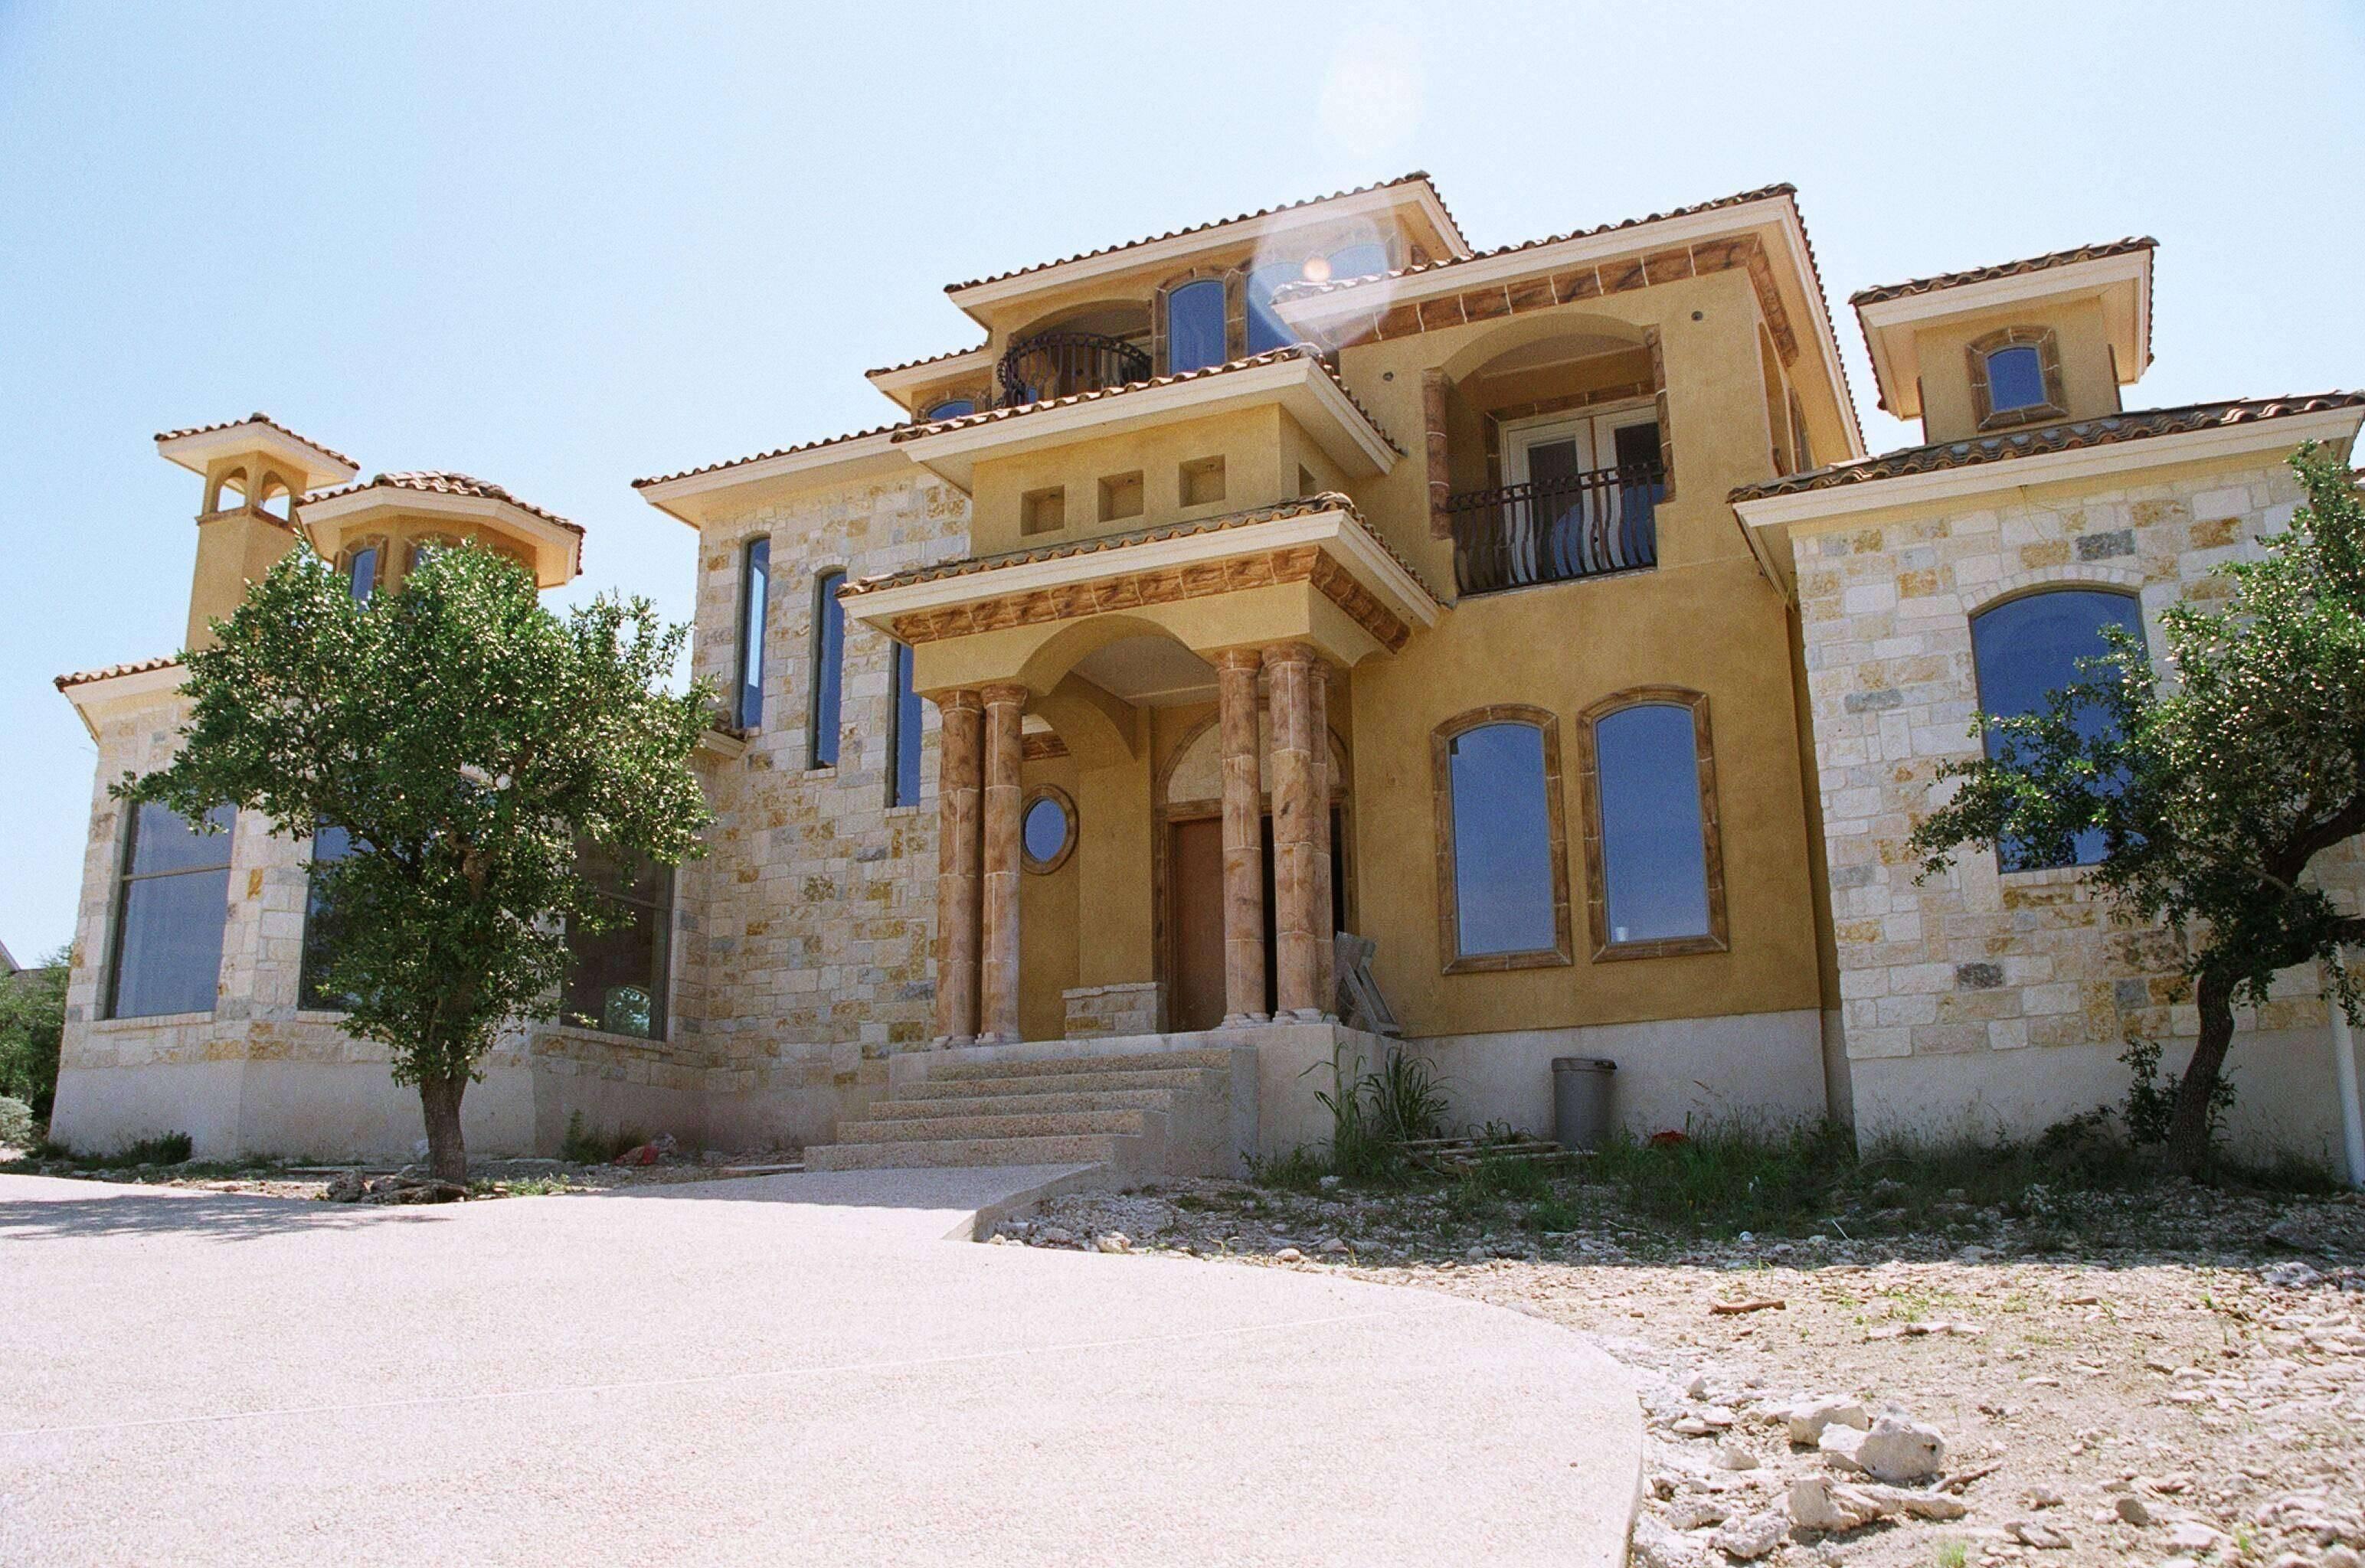 1150000 usd house for sale in san antonio texas ref 76883